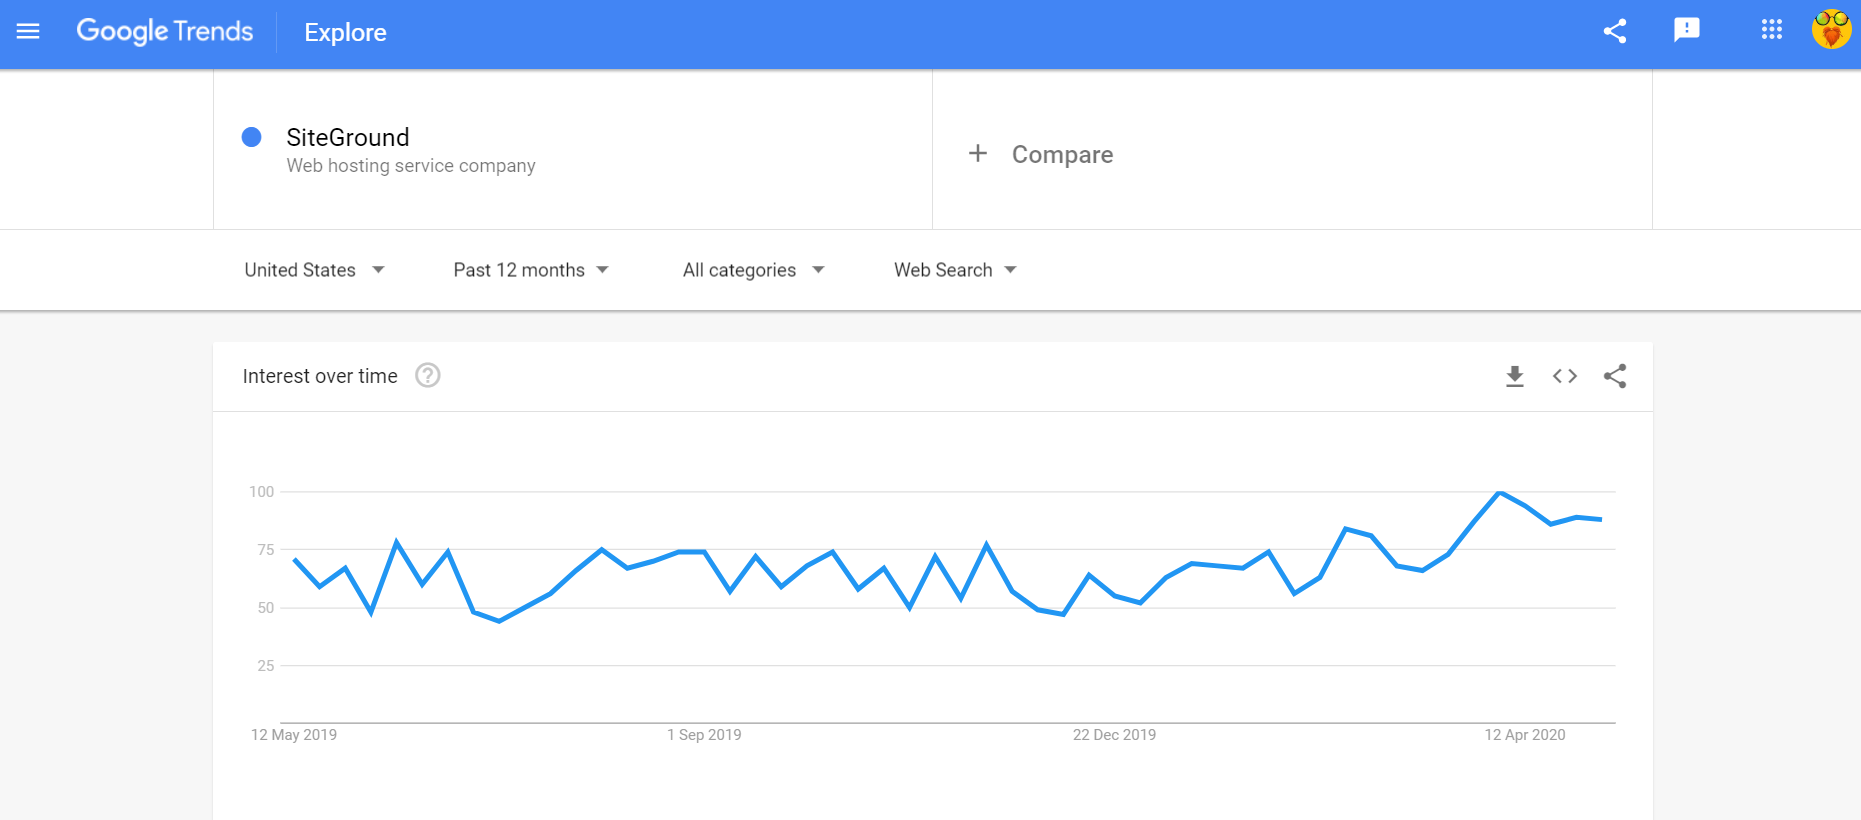 Google Trends SiteGround